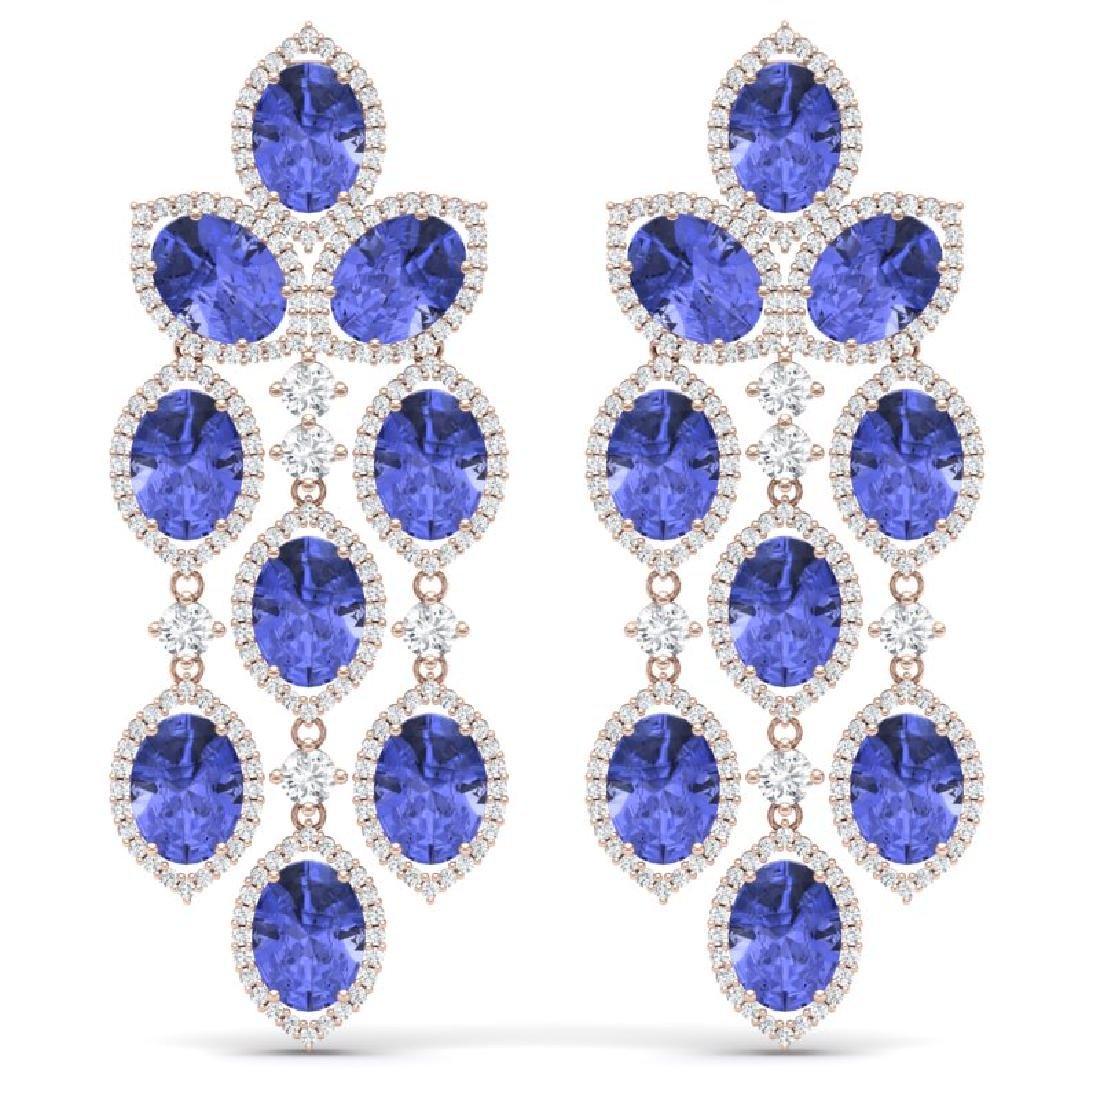 20.53 CTW Royalty Tanzanite & VS Diamond Earrings 18K